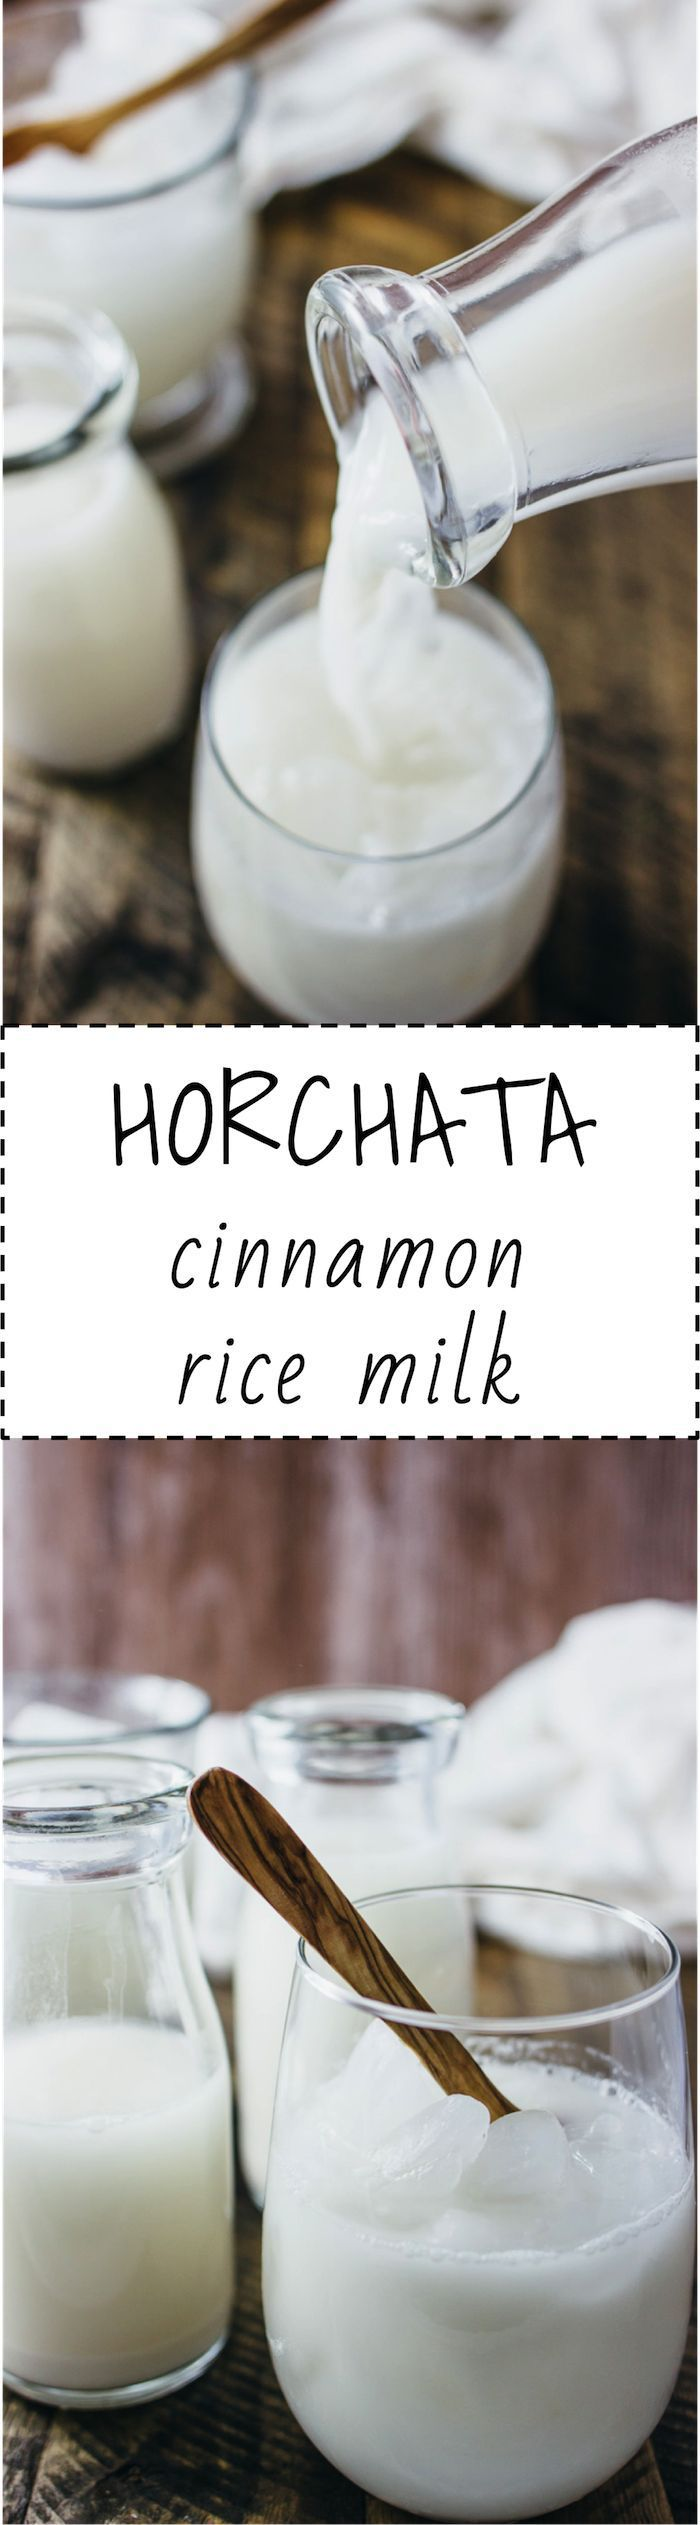 Horchata: cinnamon rice milk